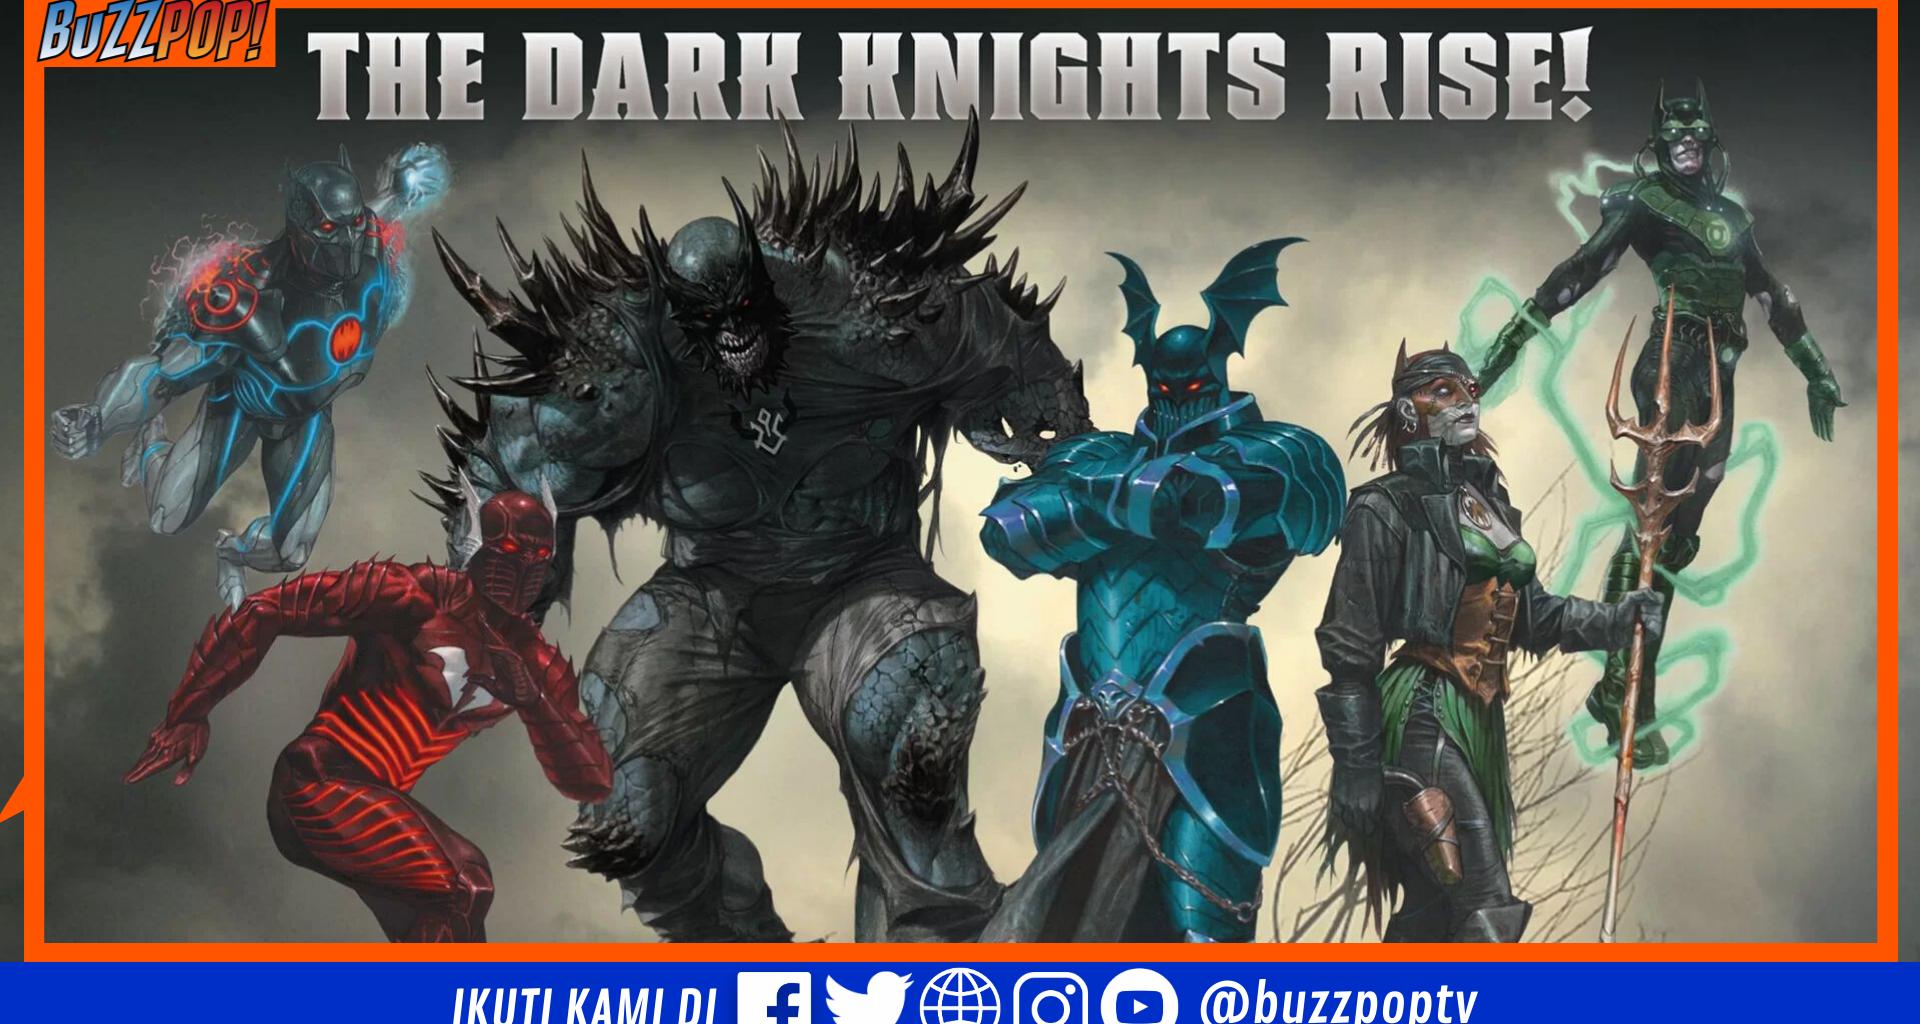 DARK KNIGHTS: METAL DC Multiverse McFarlane Toys